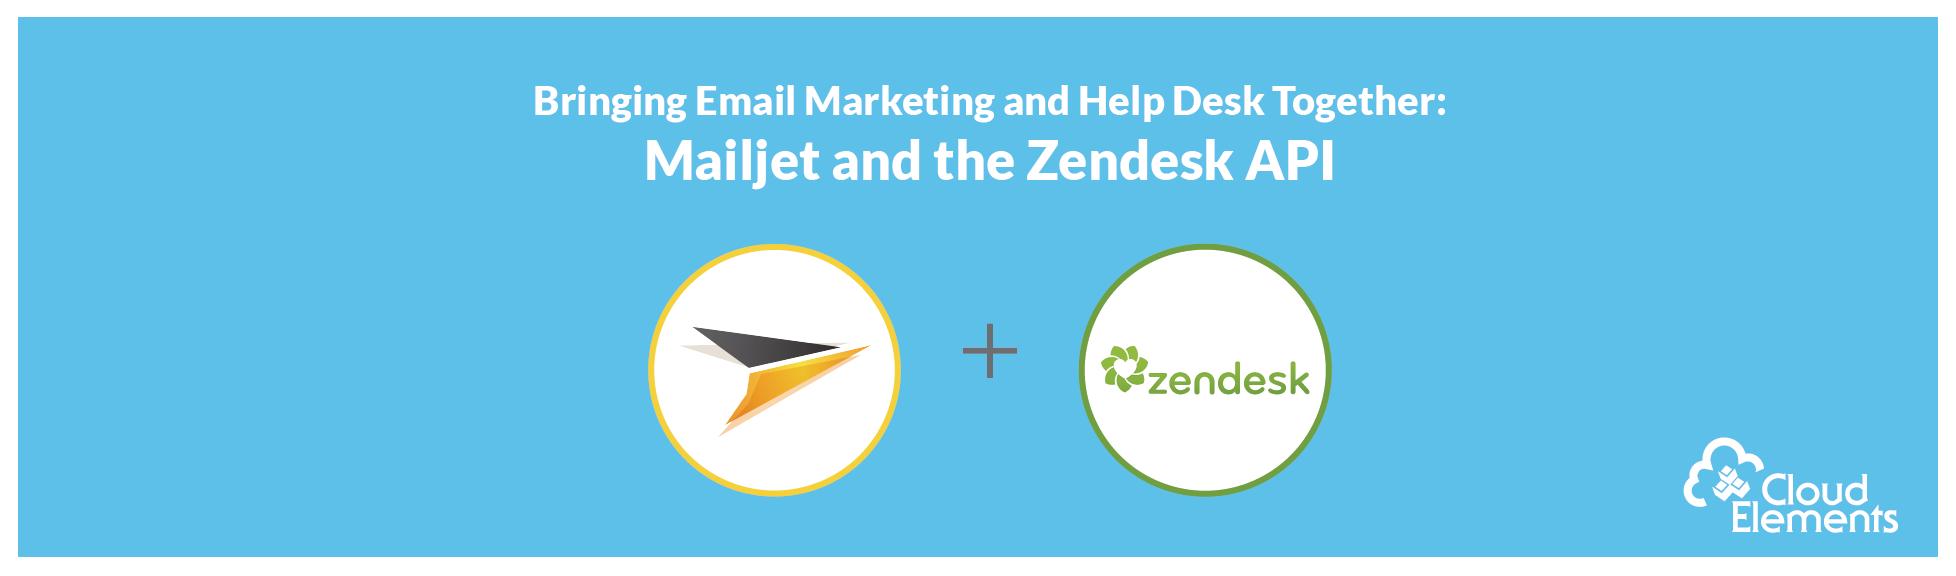 Bringing Email Marketing and Help Desk To her Mailjet